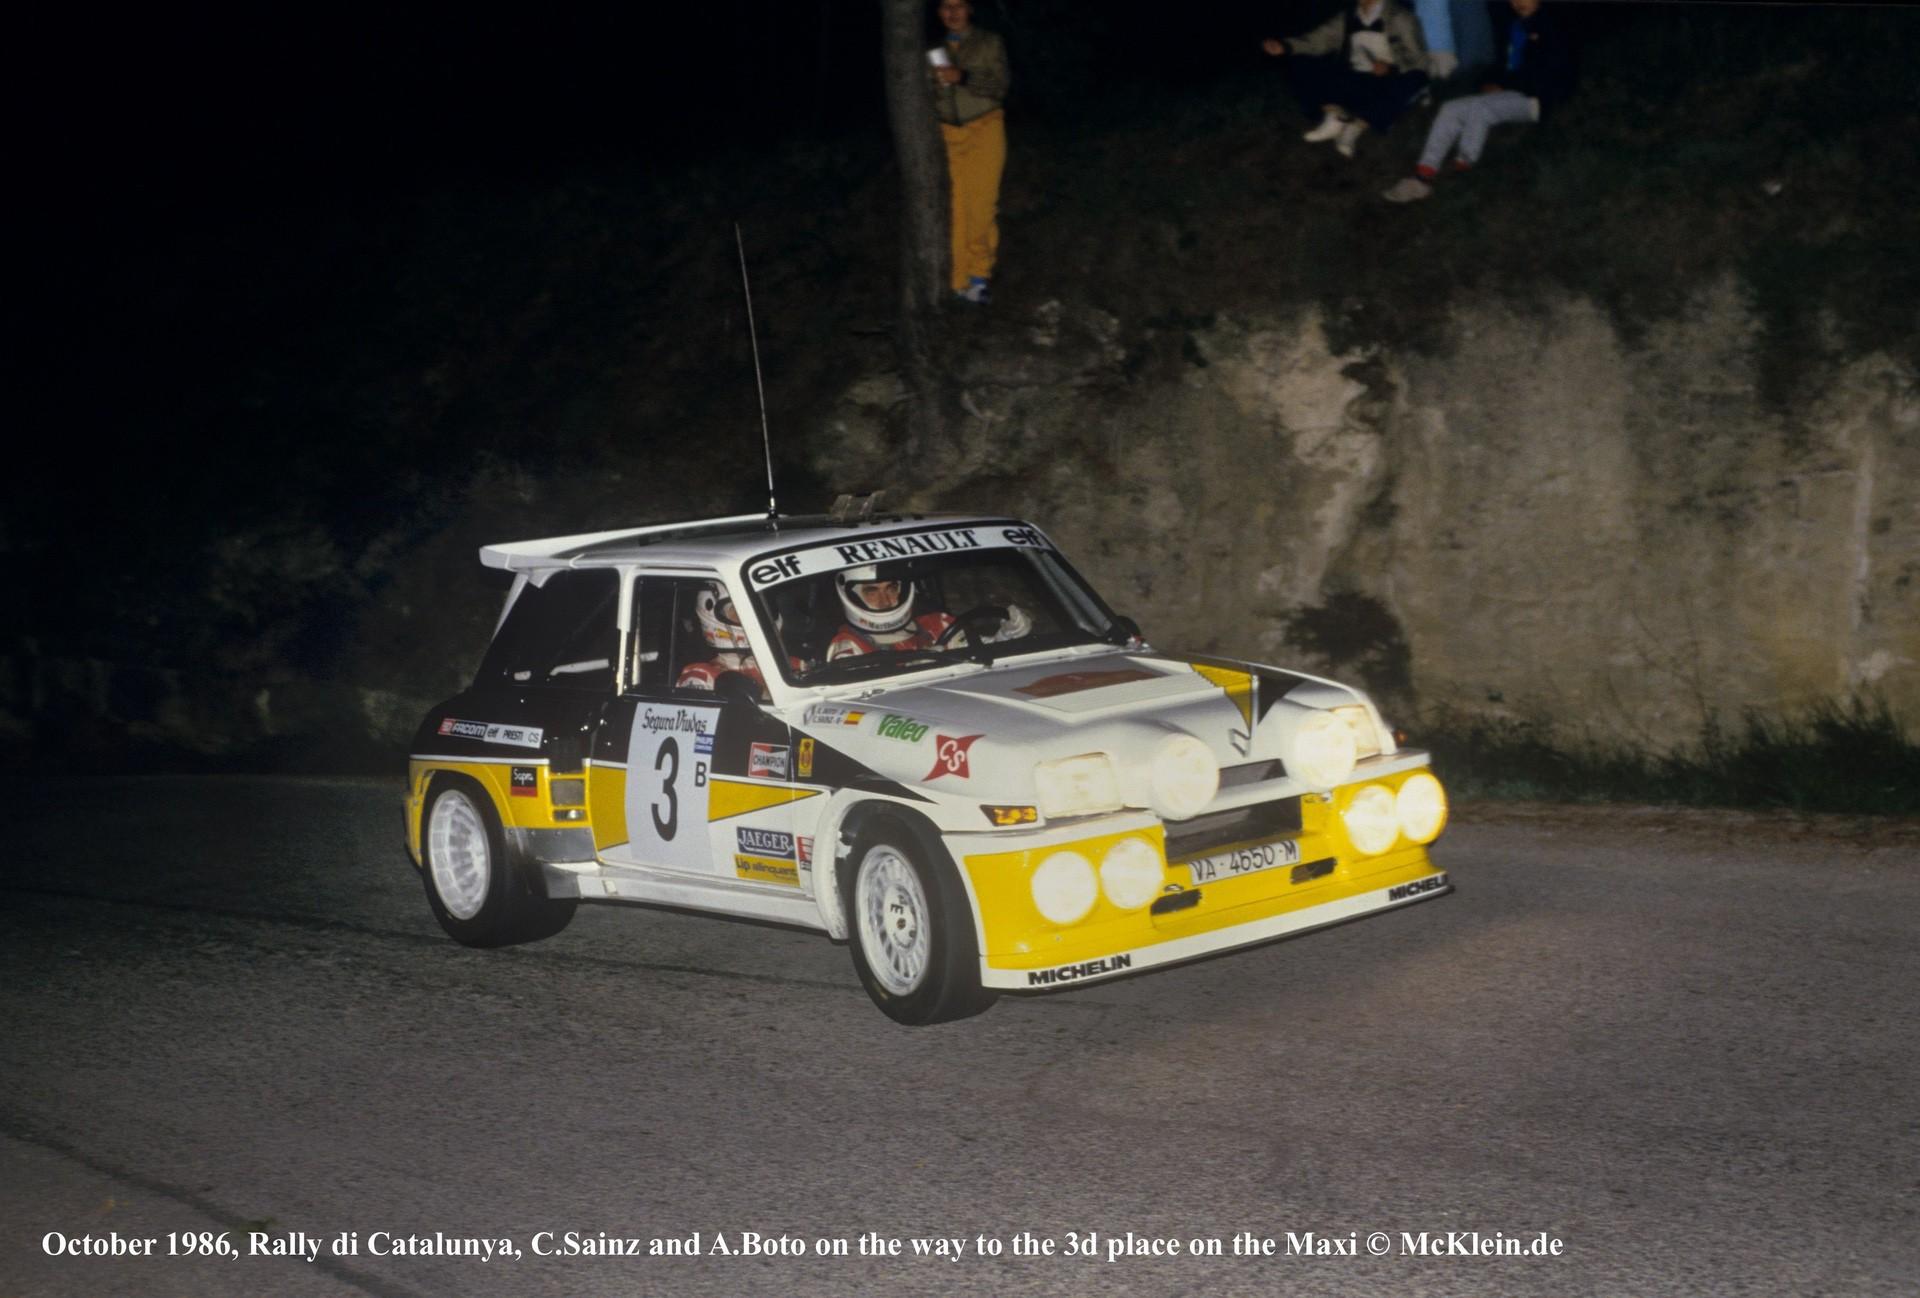 Renault_R5_Maxi_Turbo_ex-Carlos_Sainz-0049